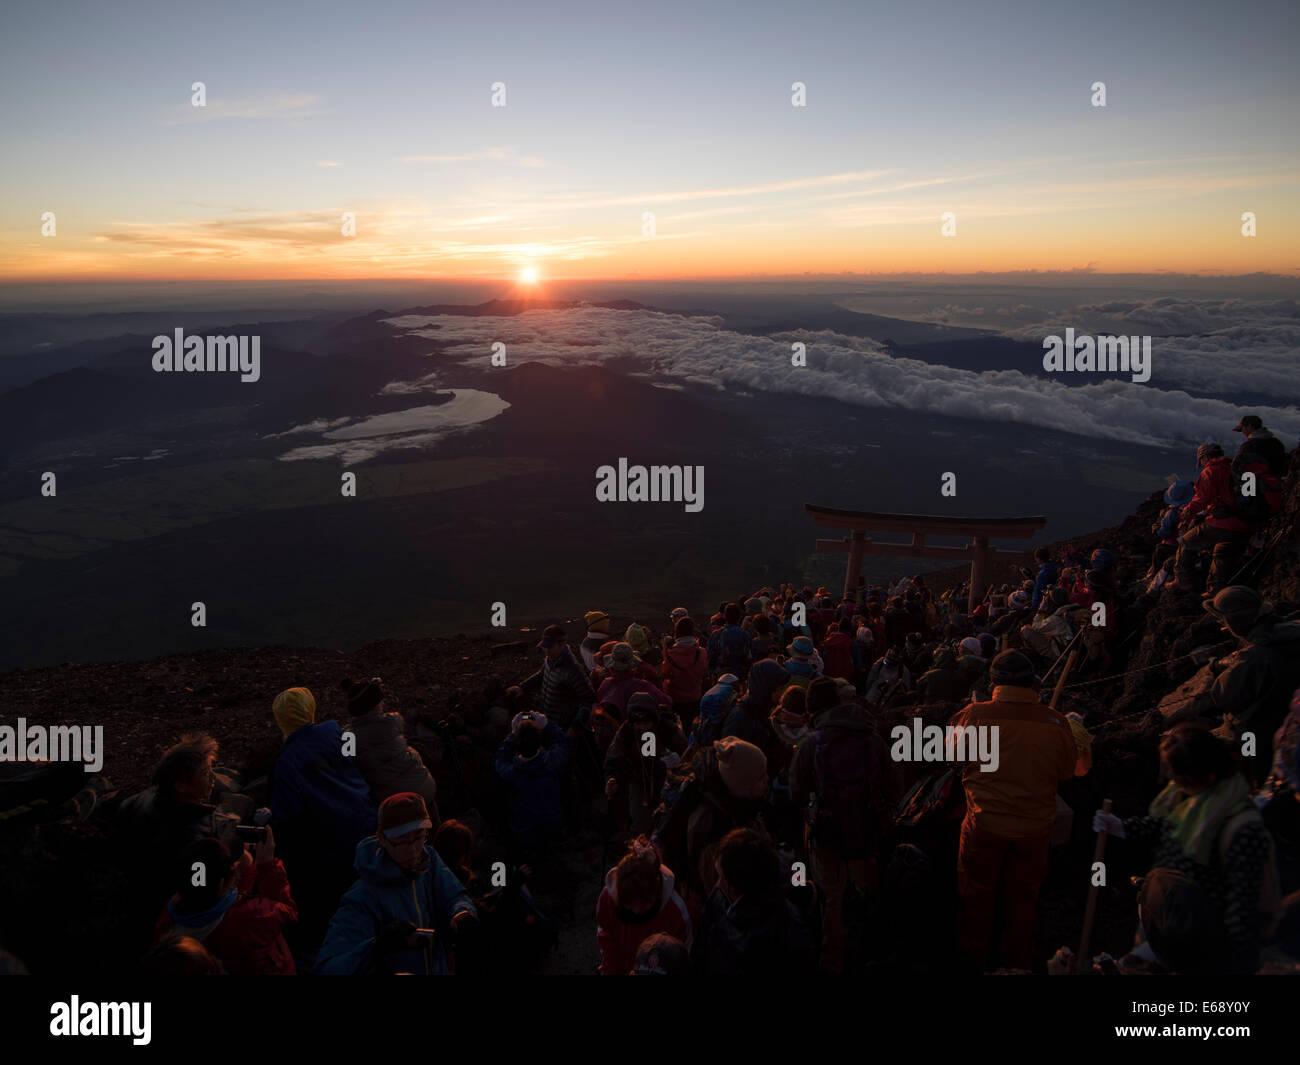 Mount Fuji, Japan. 19th Aug, 2014. The climbing season for Mt. Fuji runs July 1 to September 14. Thousands climb - Stock Image